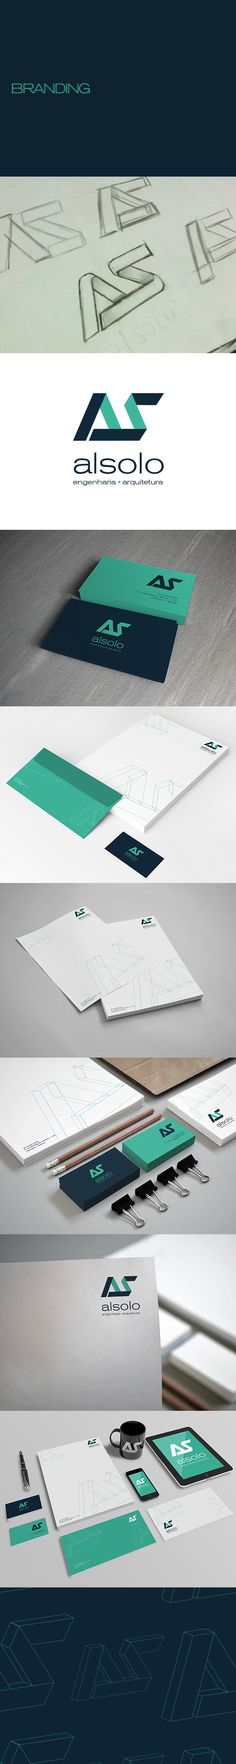 Alsolo - Rebranding